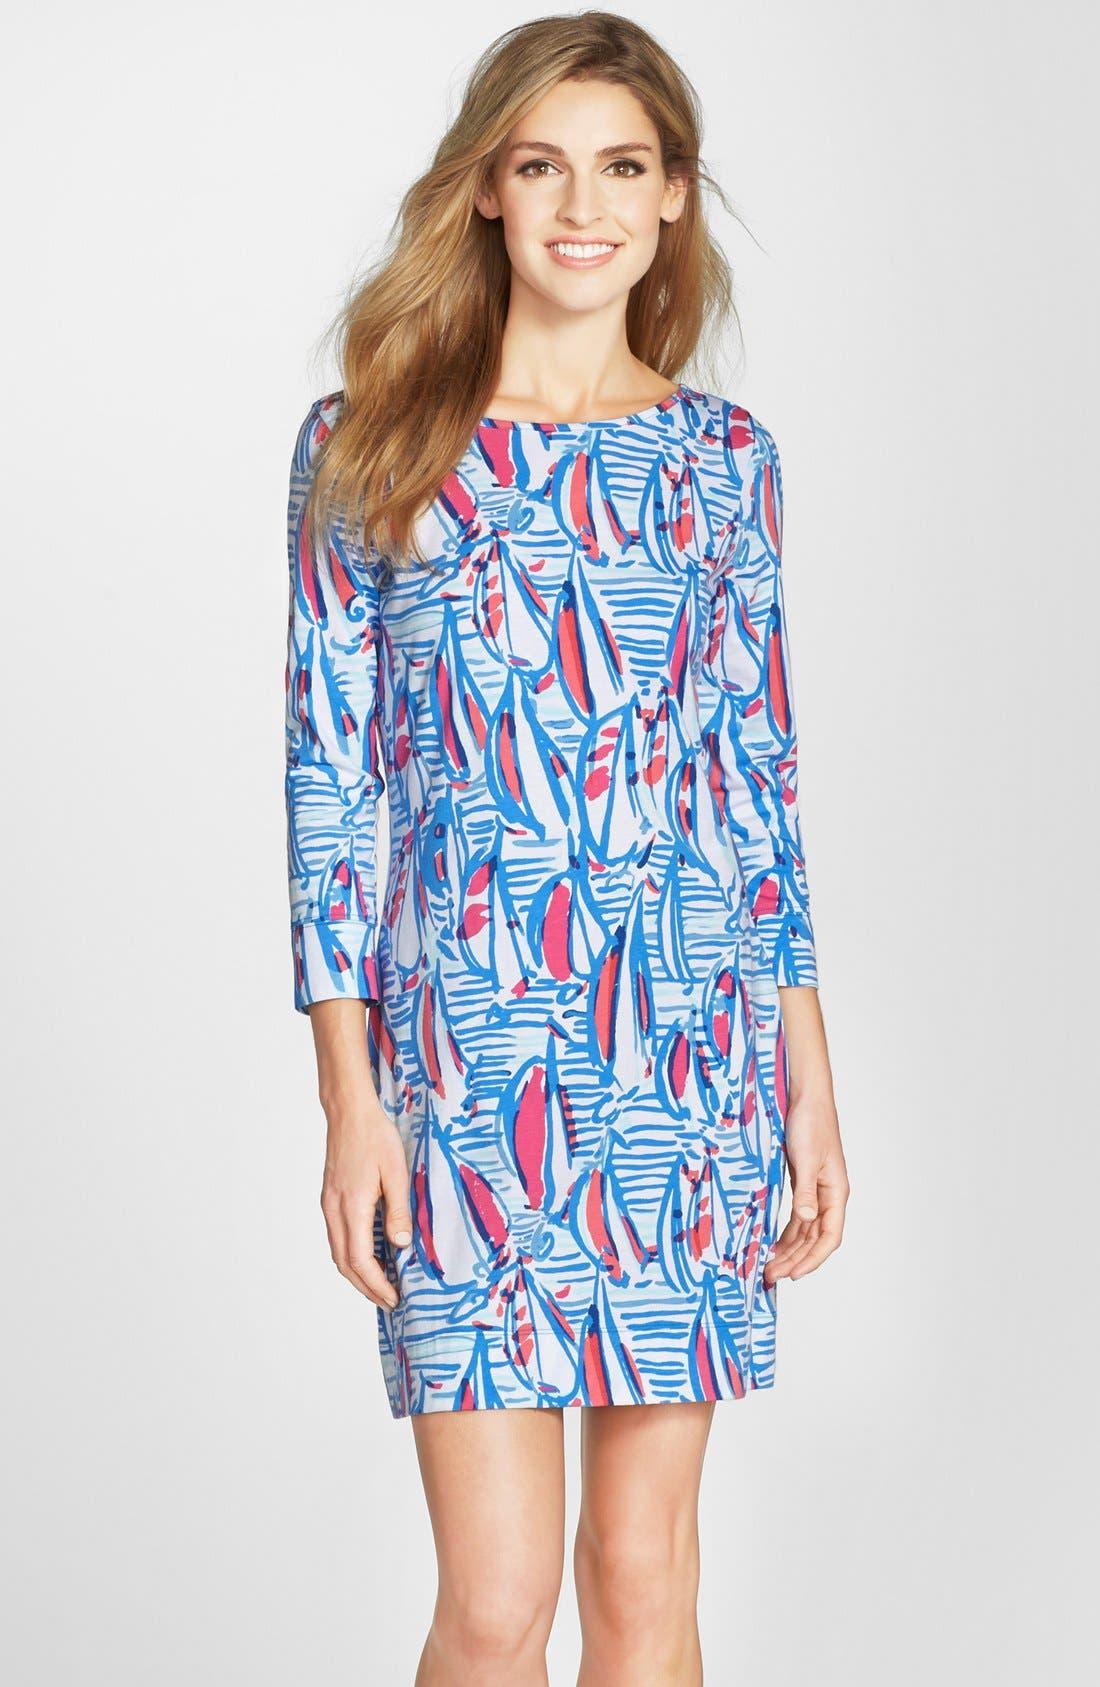 Alternate Image 1 Selected - Lilly Pulitzer® 'Marlowe' Print Pima Cotton Shift Dress